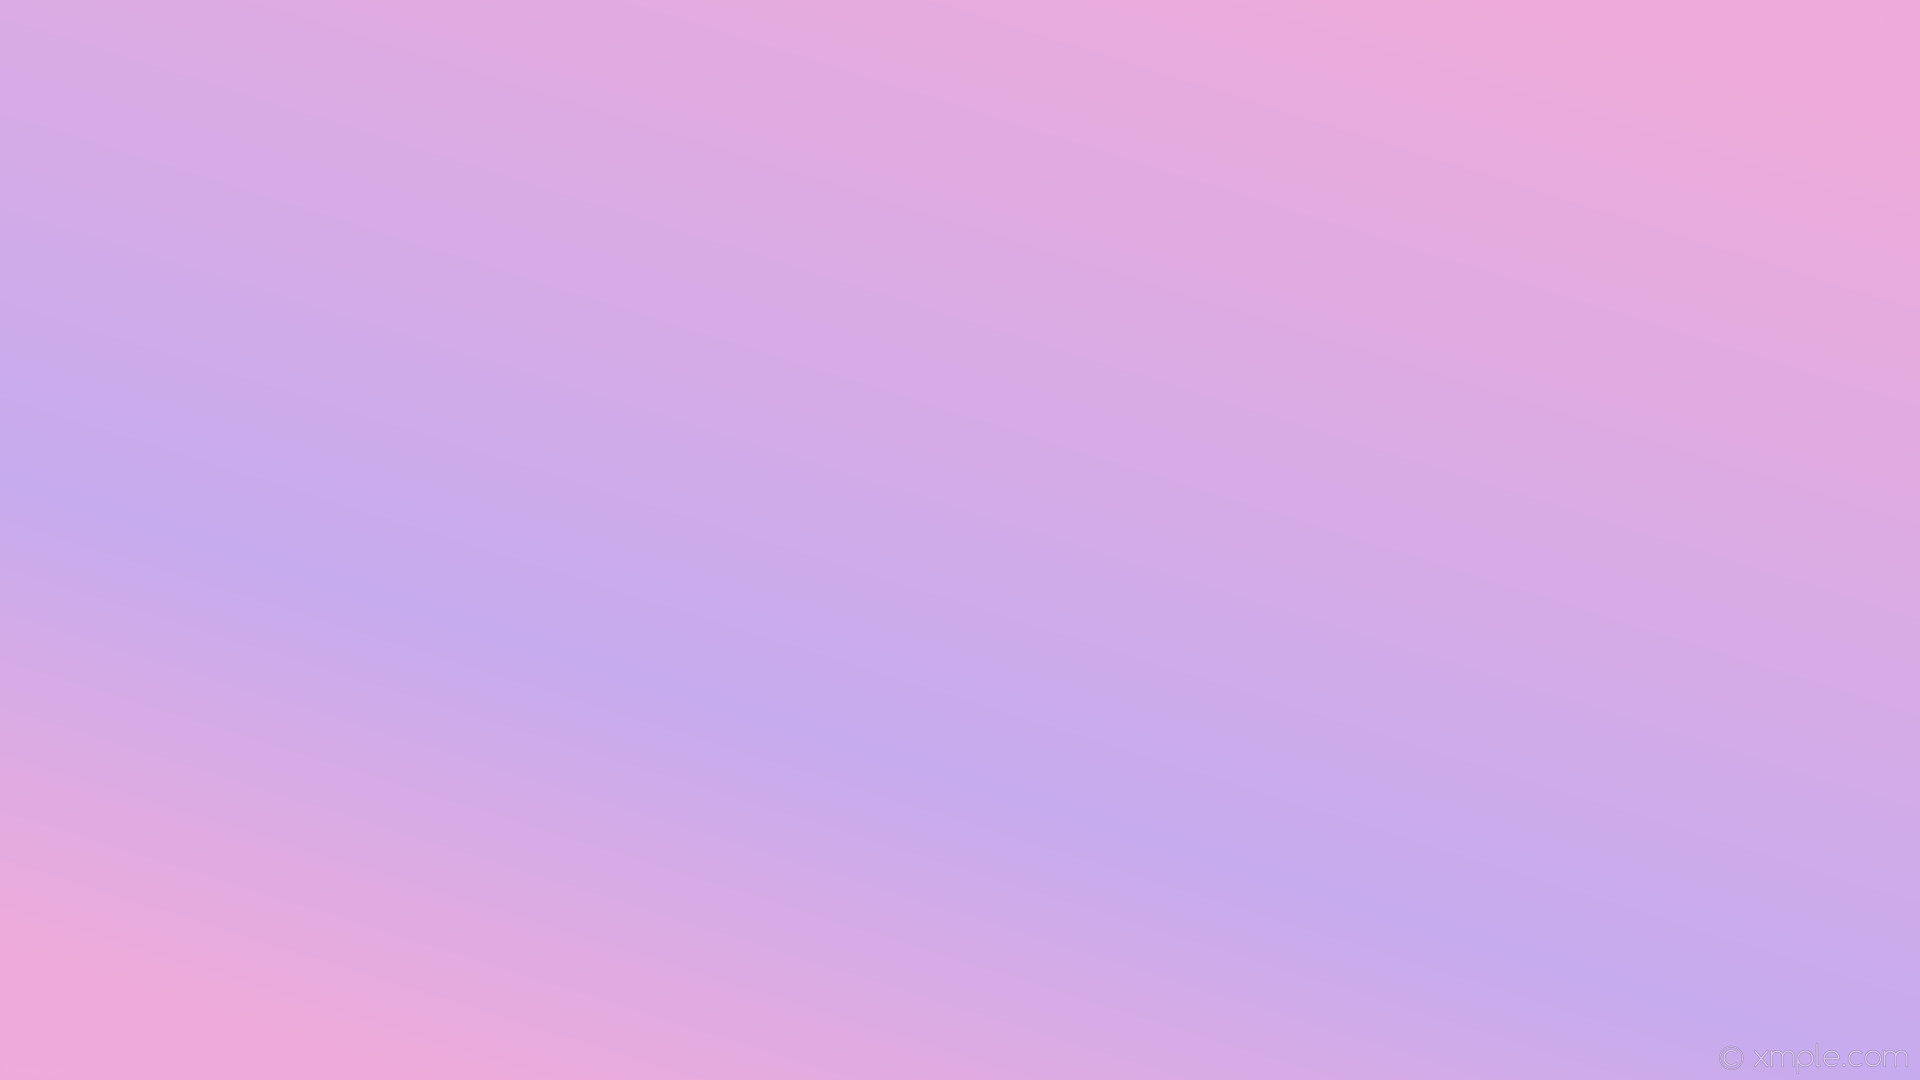 wallpaper linear pink violet highlight gradient light pink light violet  #eeabda #c6abee 45°